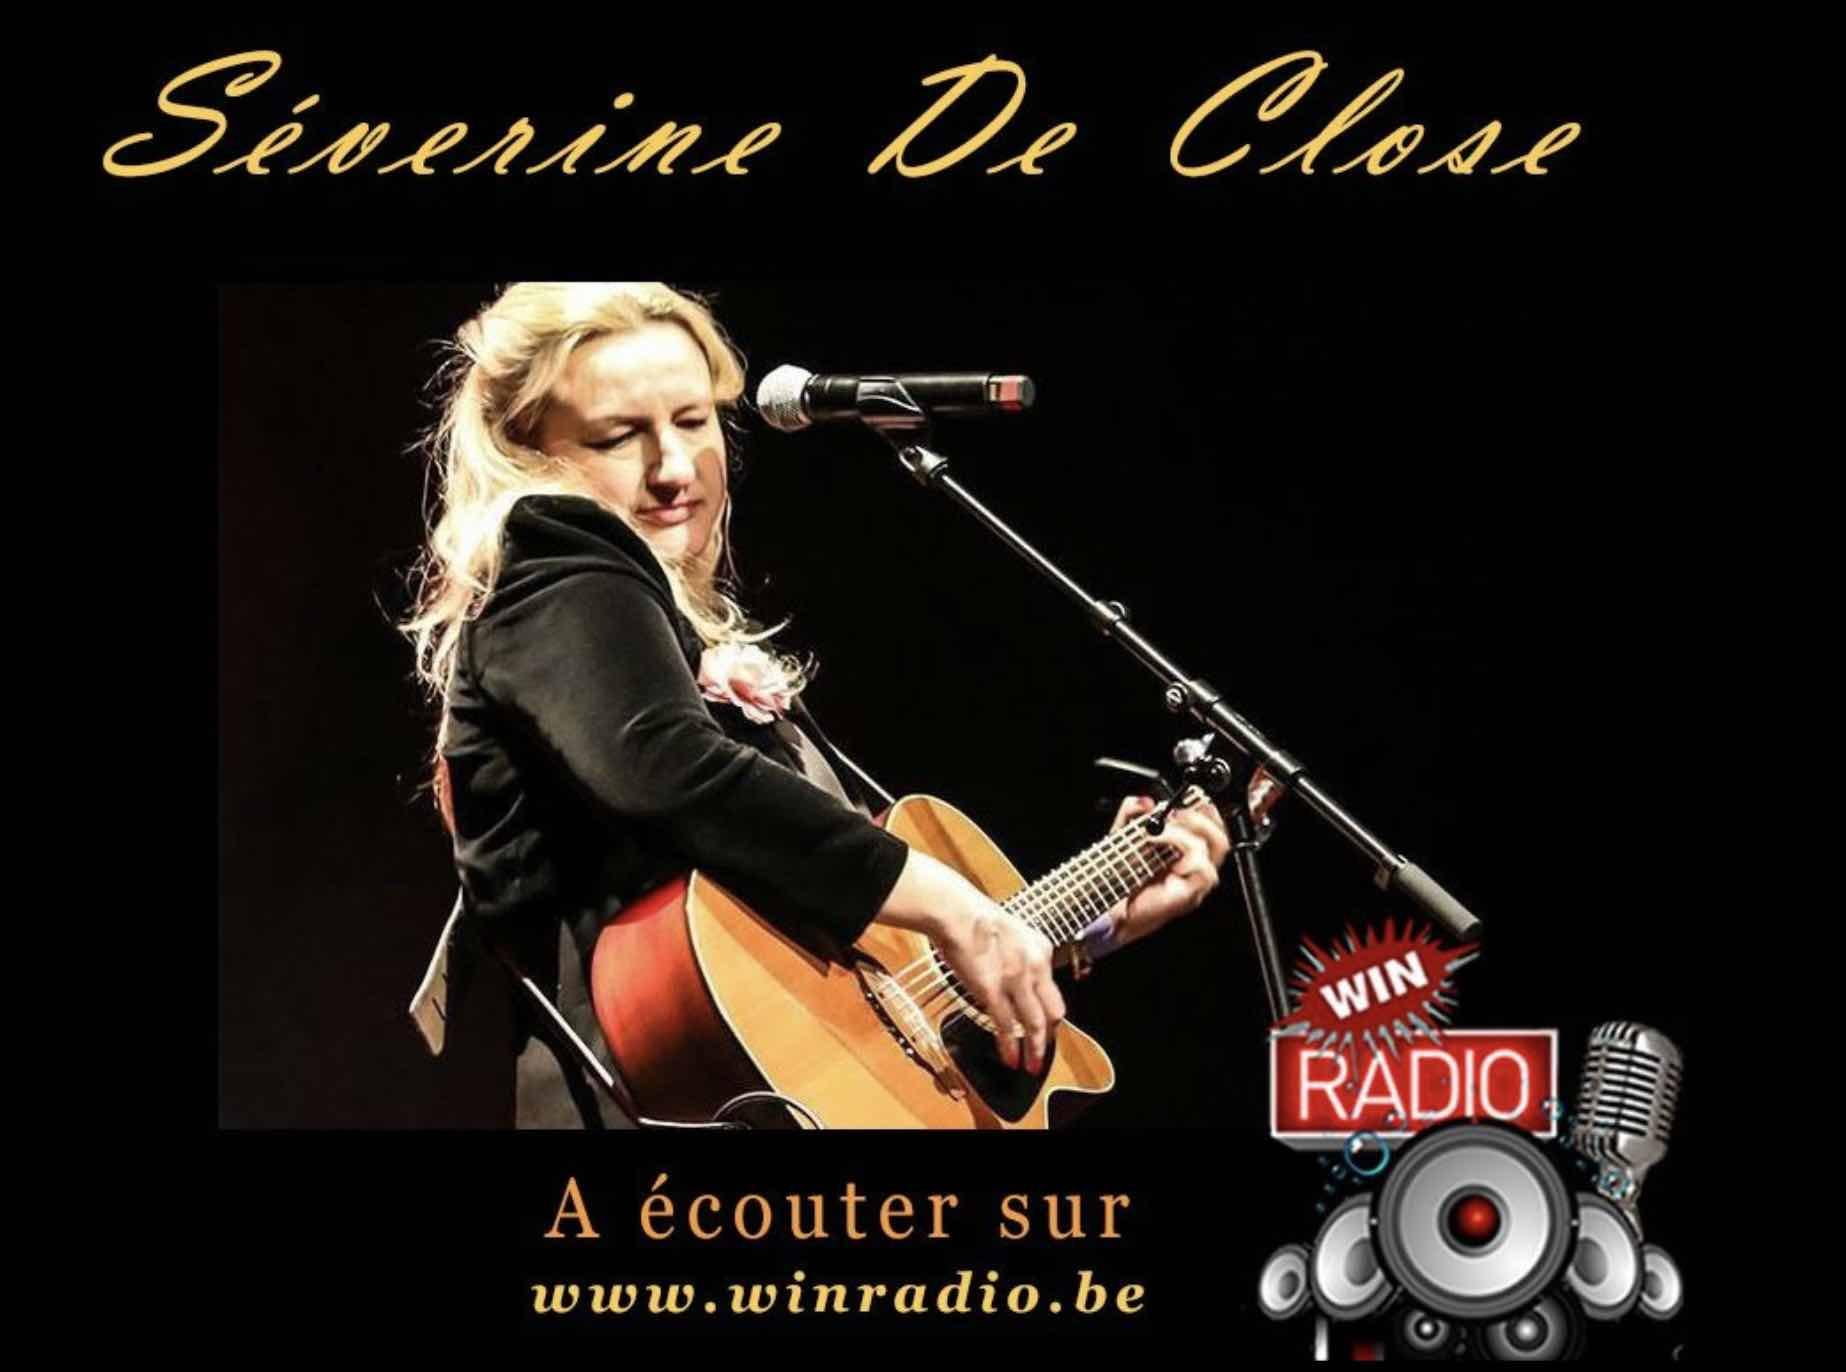 Les titres de Séverine de Close dans la programmation de Win radio (Belgique)